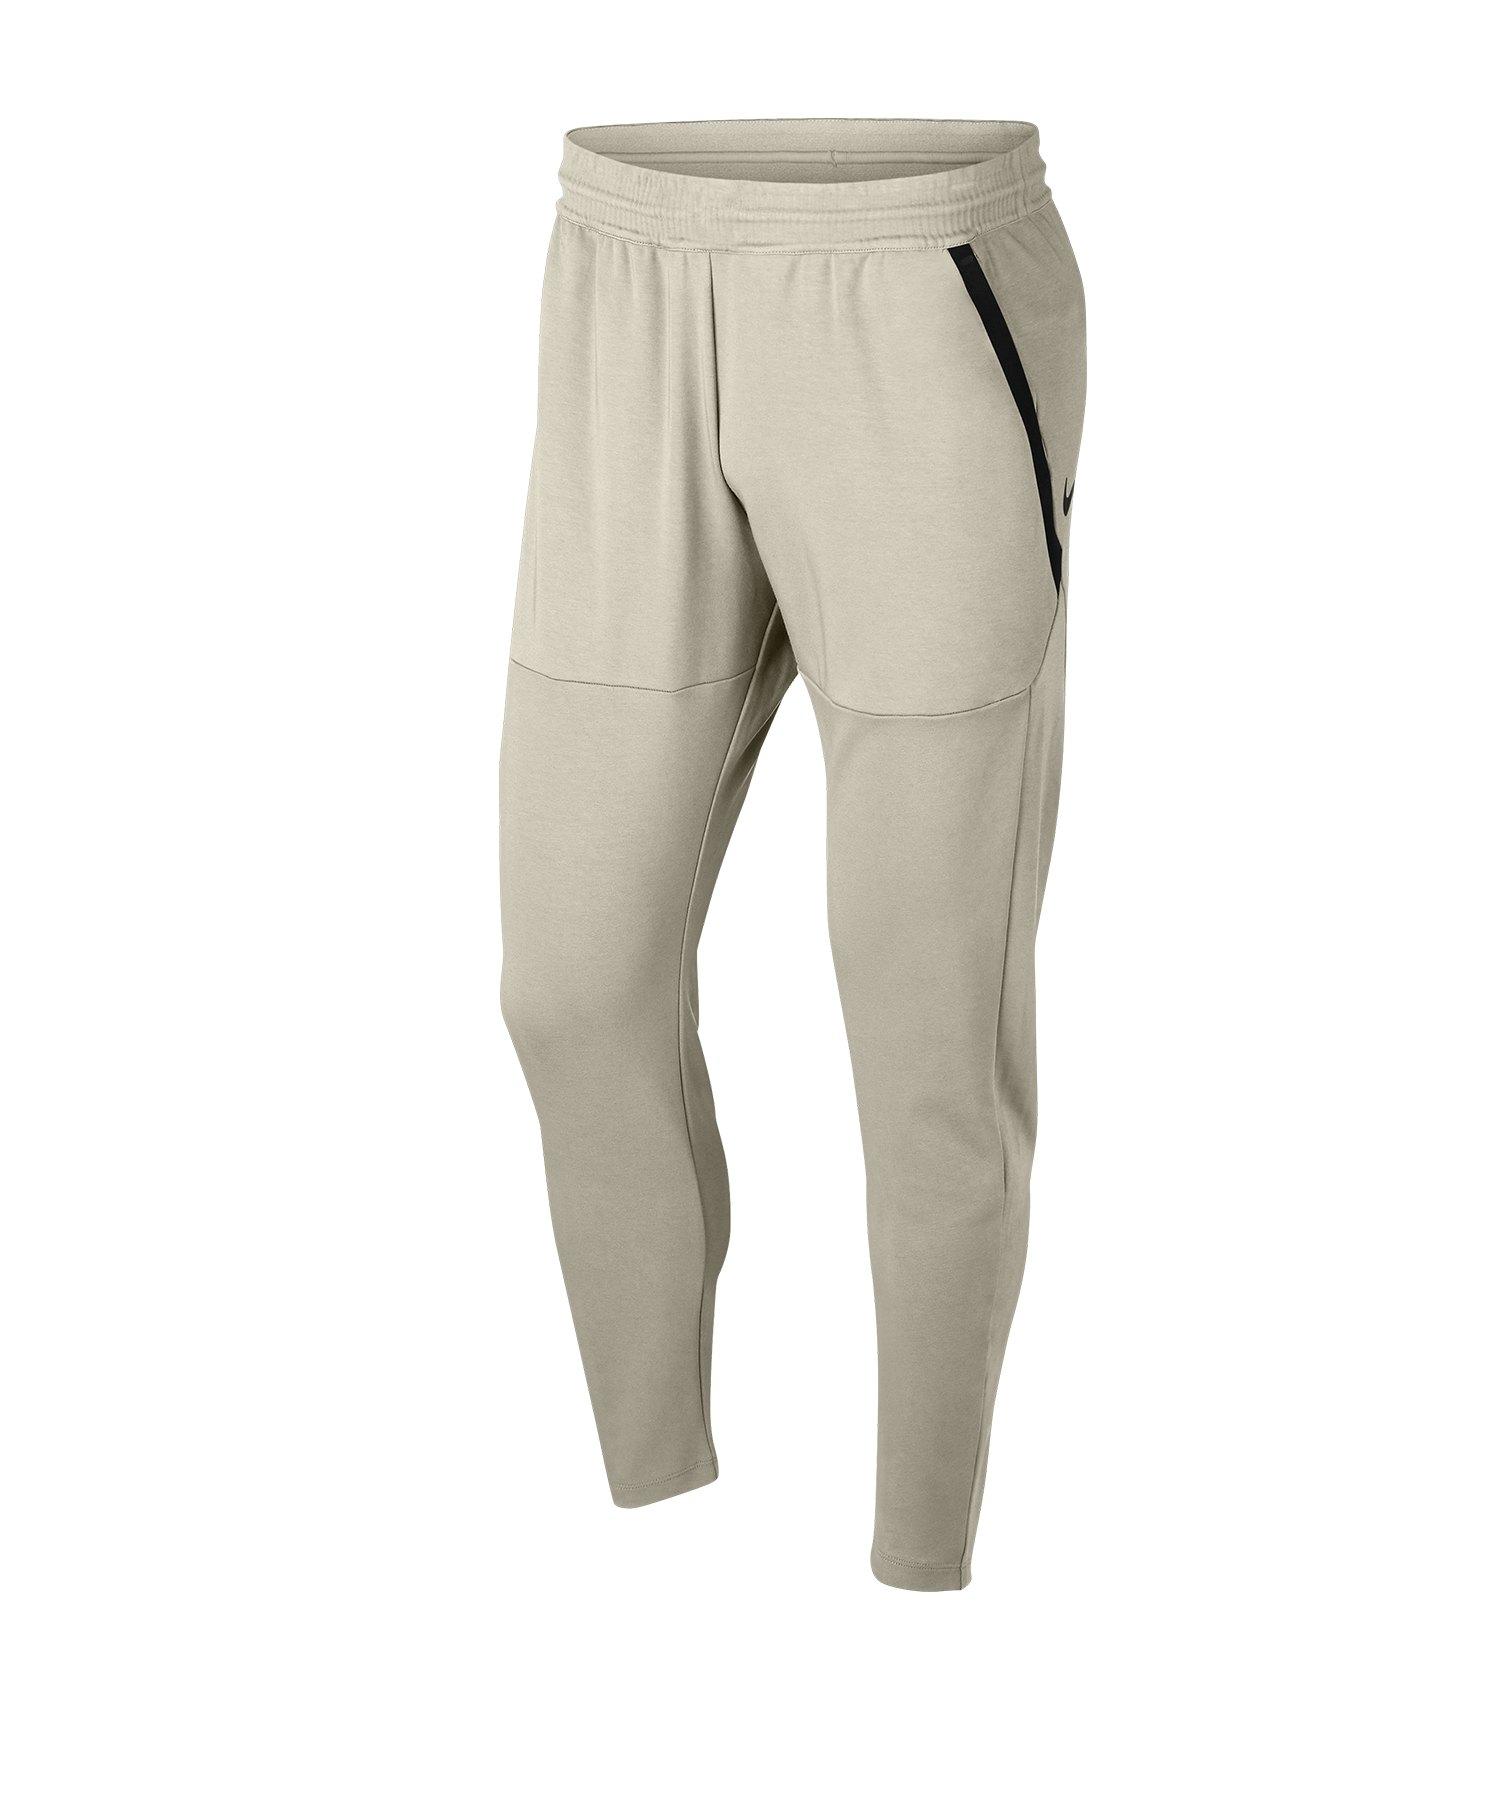 Nike Tech Pack Pant Jogginghose Grau F072 - grau